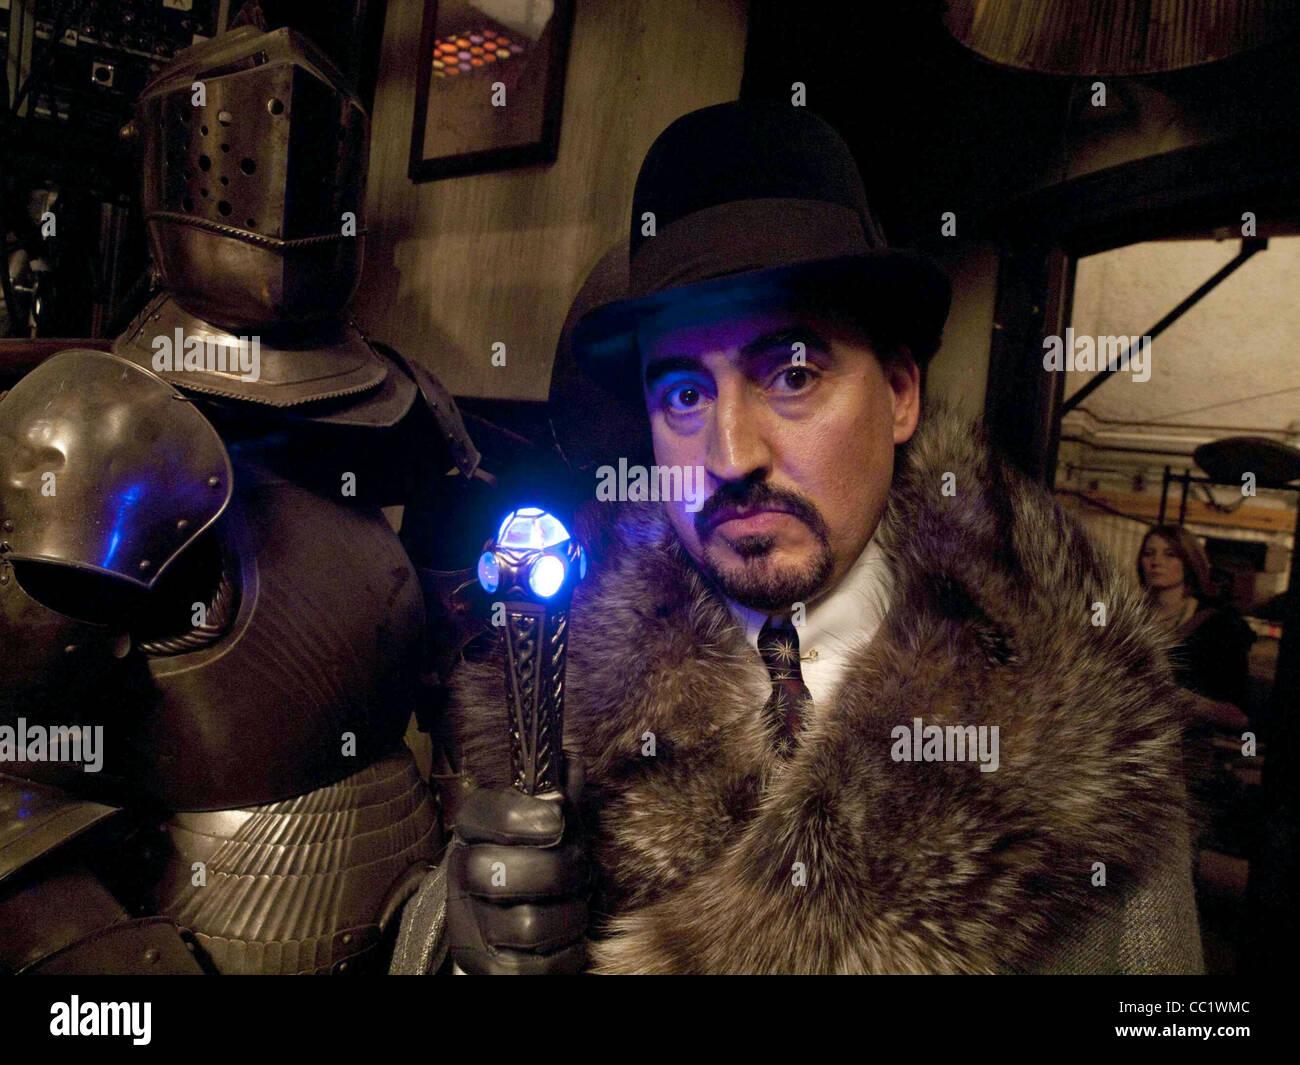 Alfred Molina The Sorcerer S Apprentice 2010 Stock Photo Alamy